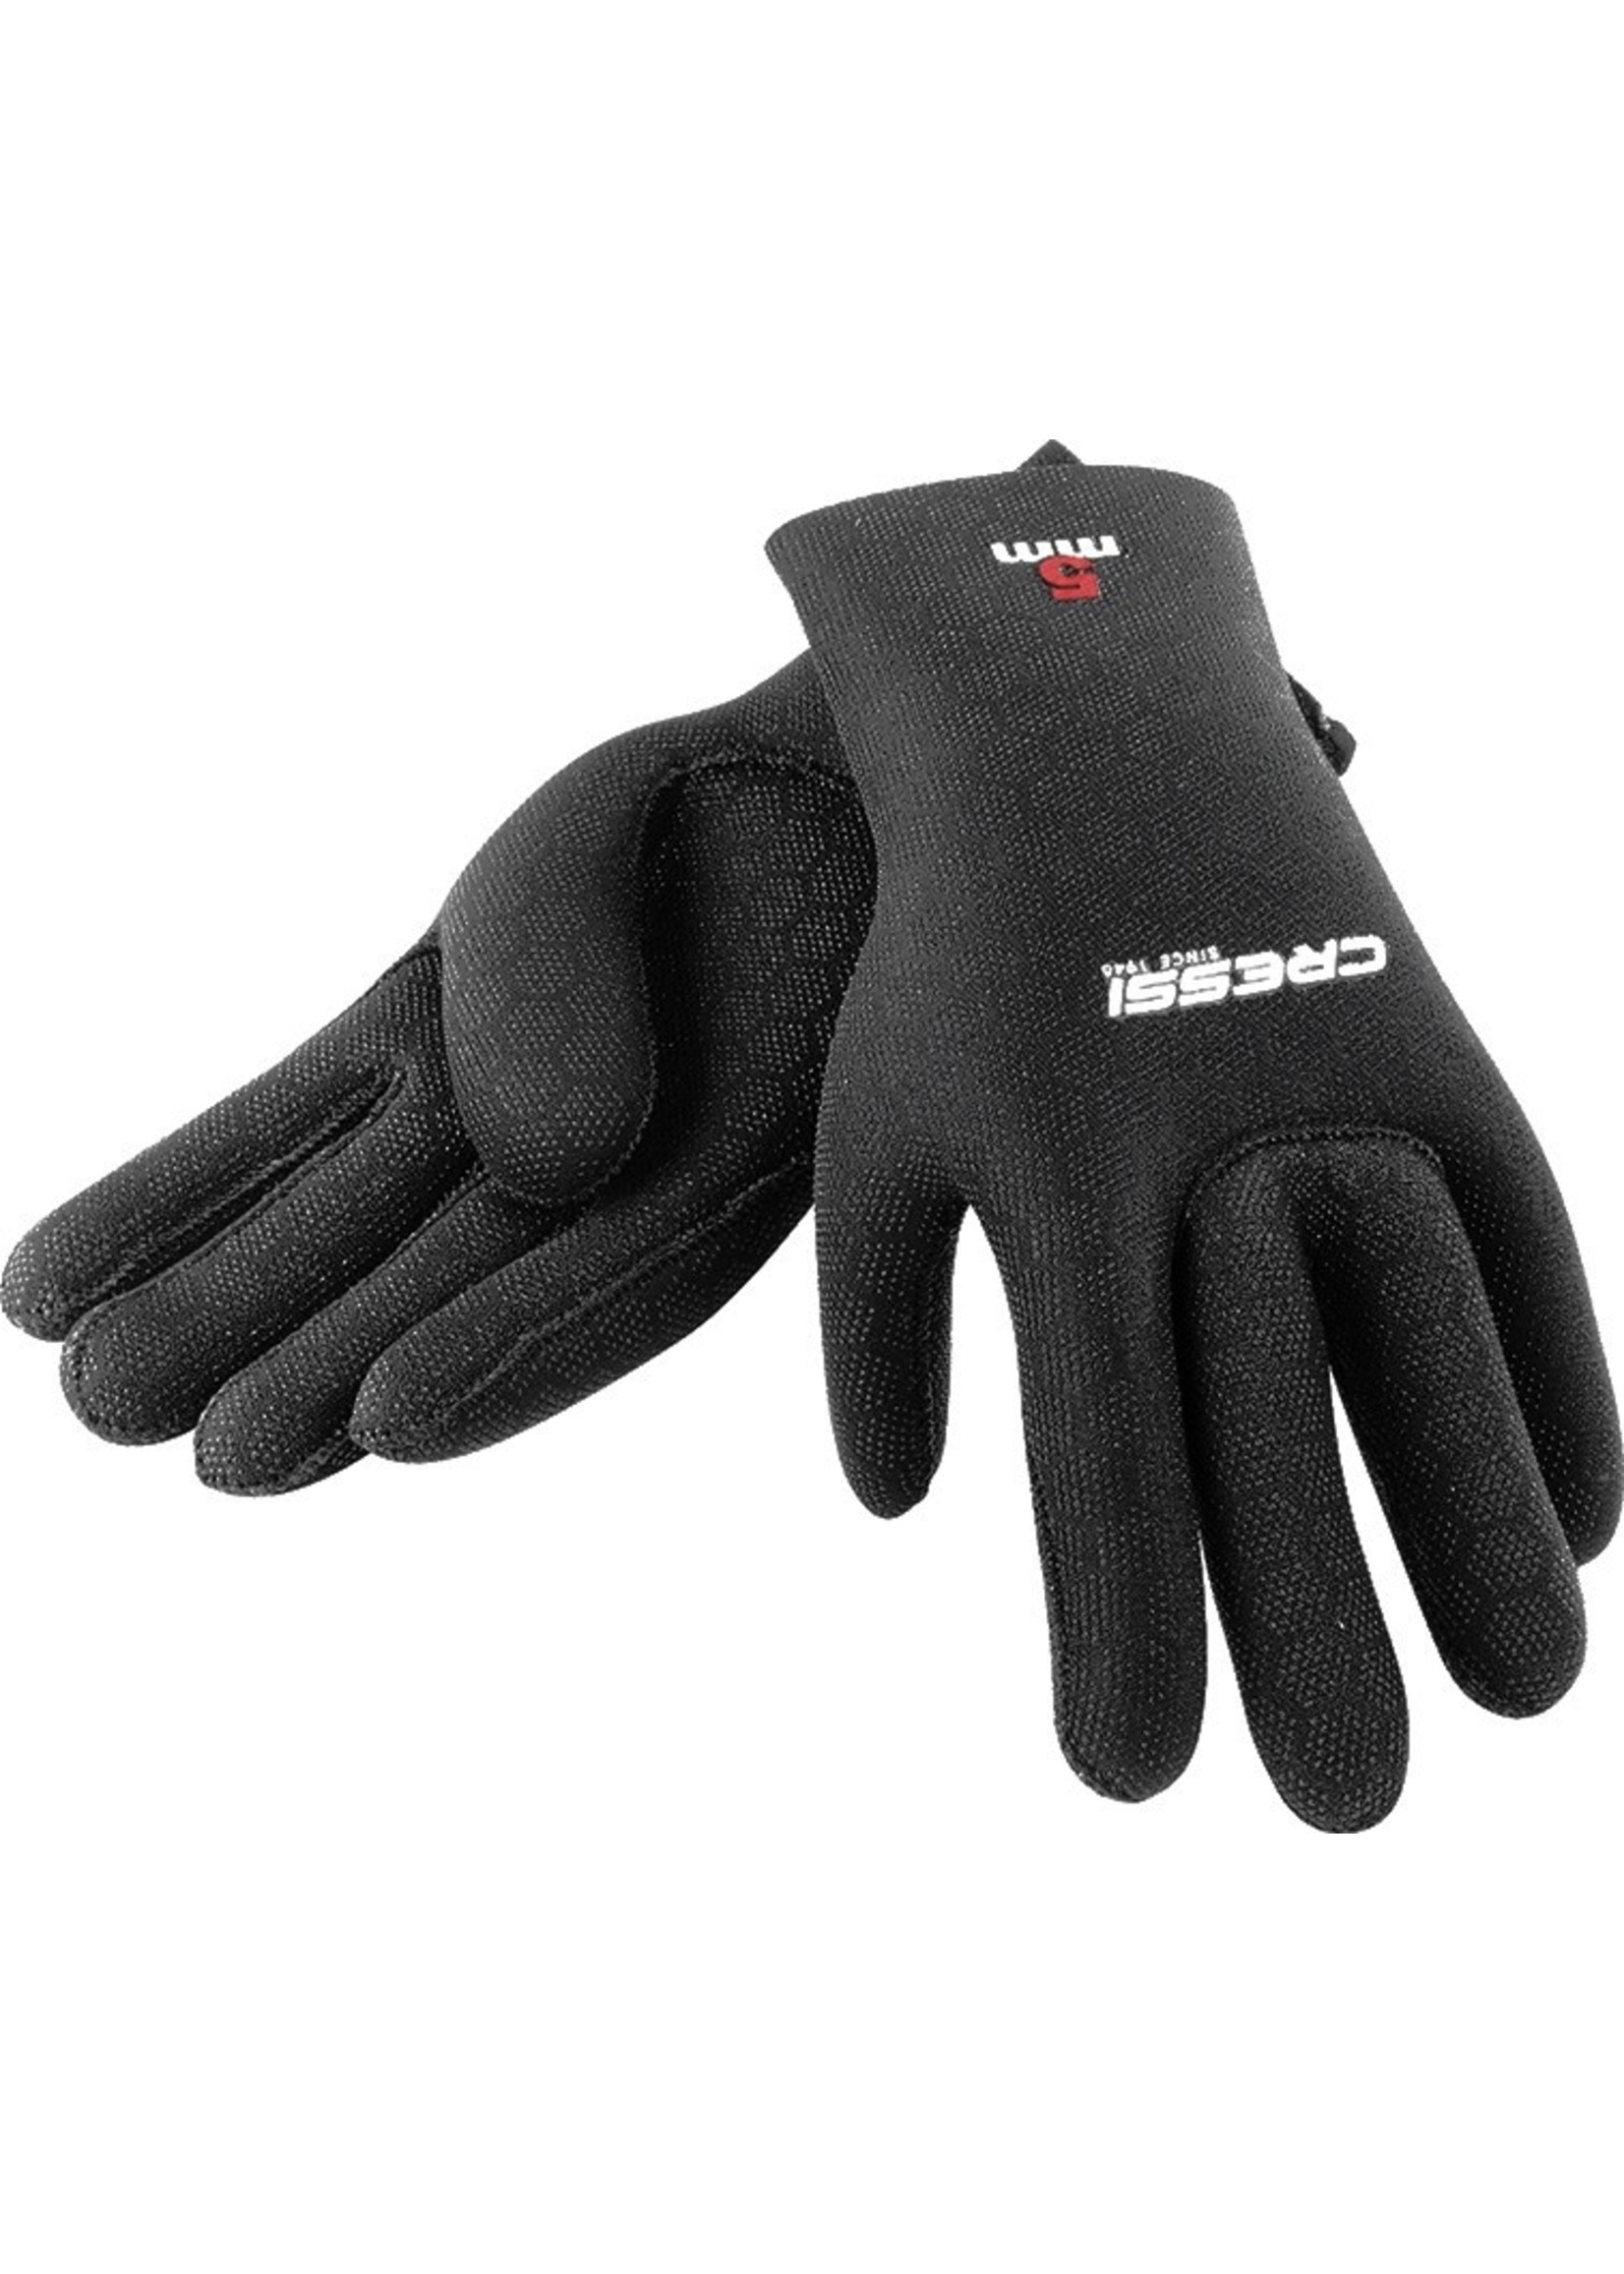 Cressi High Stretch Handschoenen 3.5mm